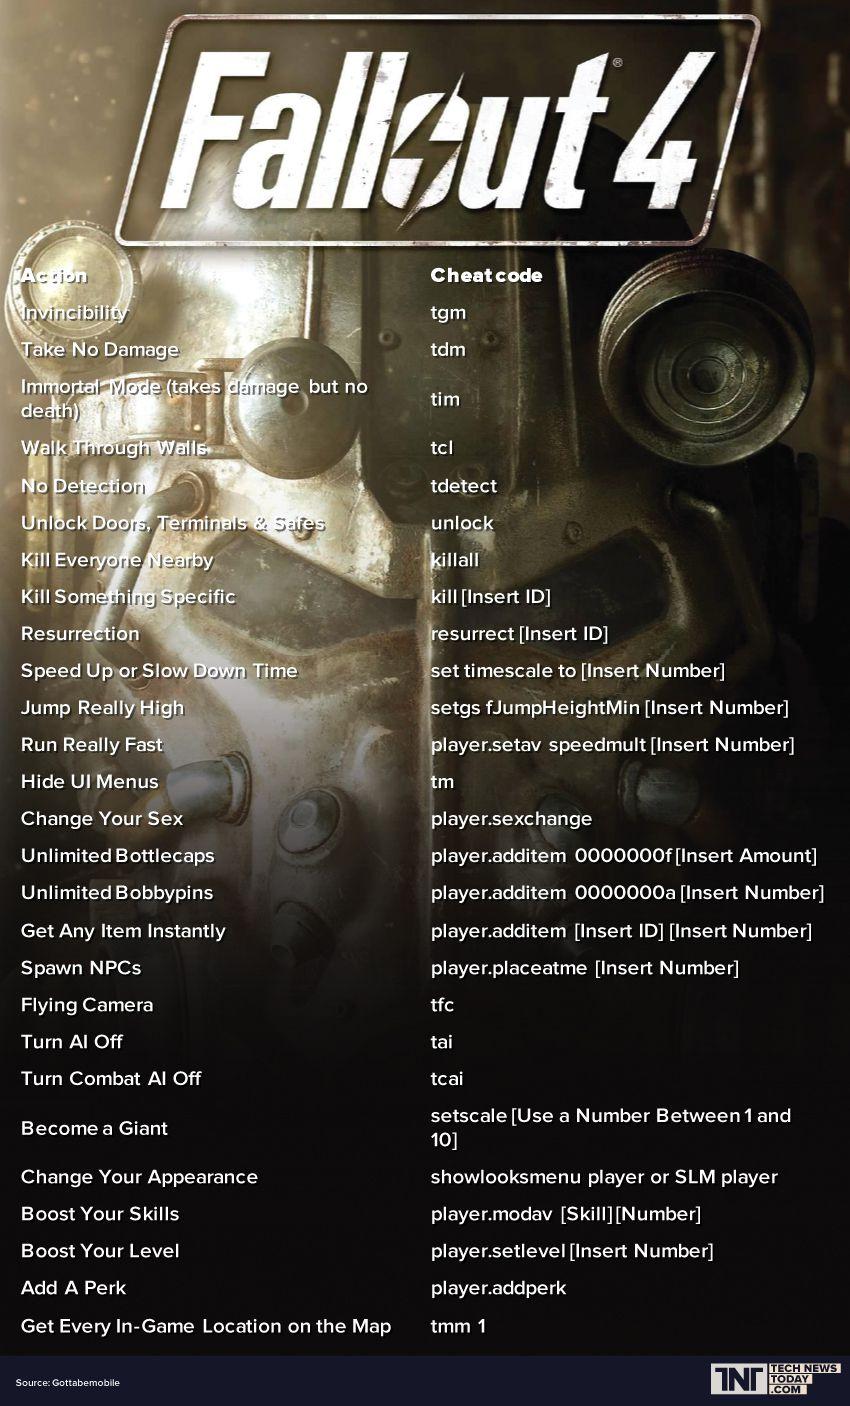 <b>Fallout 4 PC Cheats</b>; God Mode, No Damage, Money, Boost Skill And More!